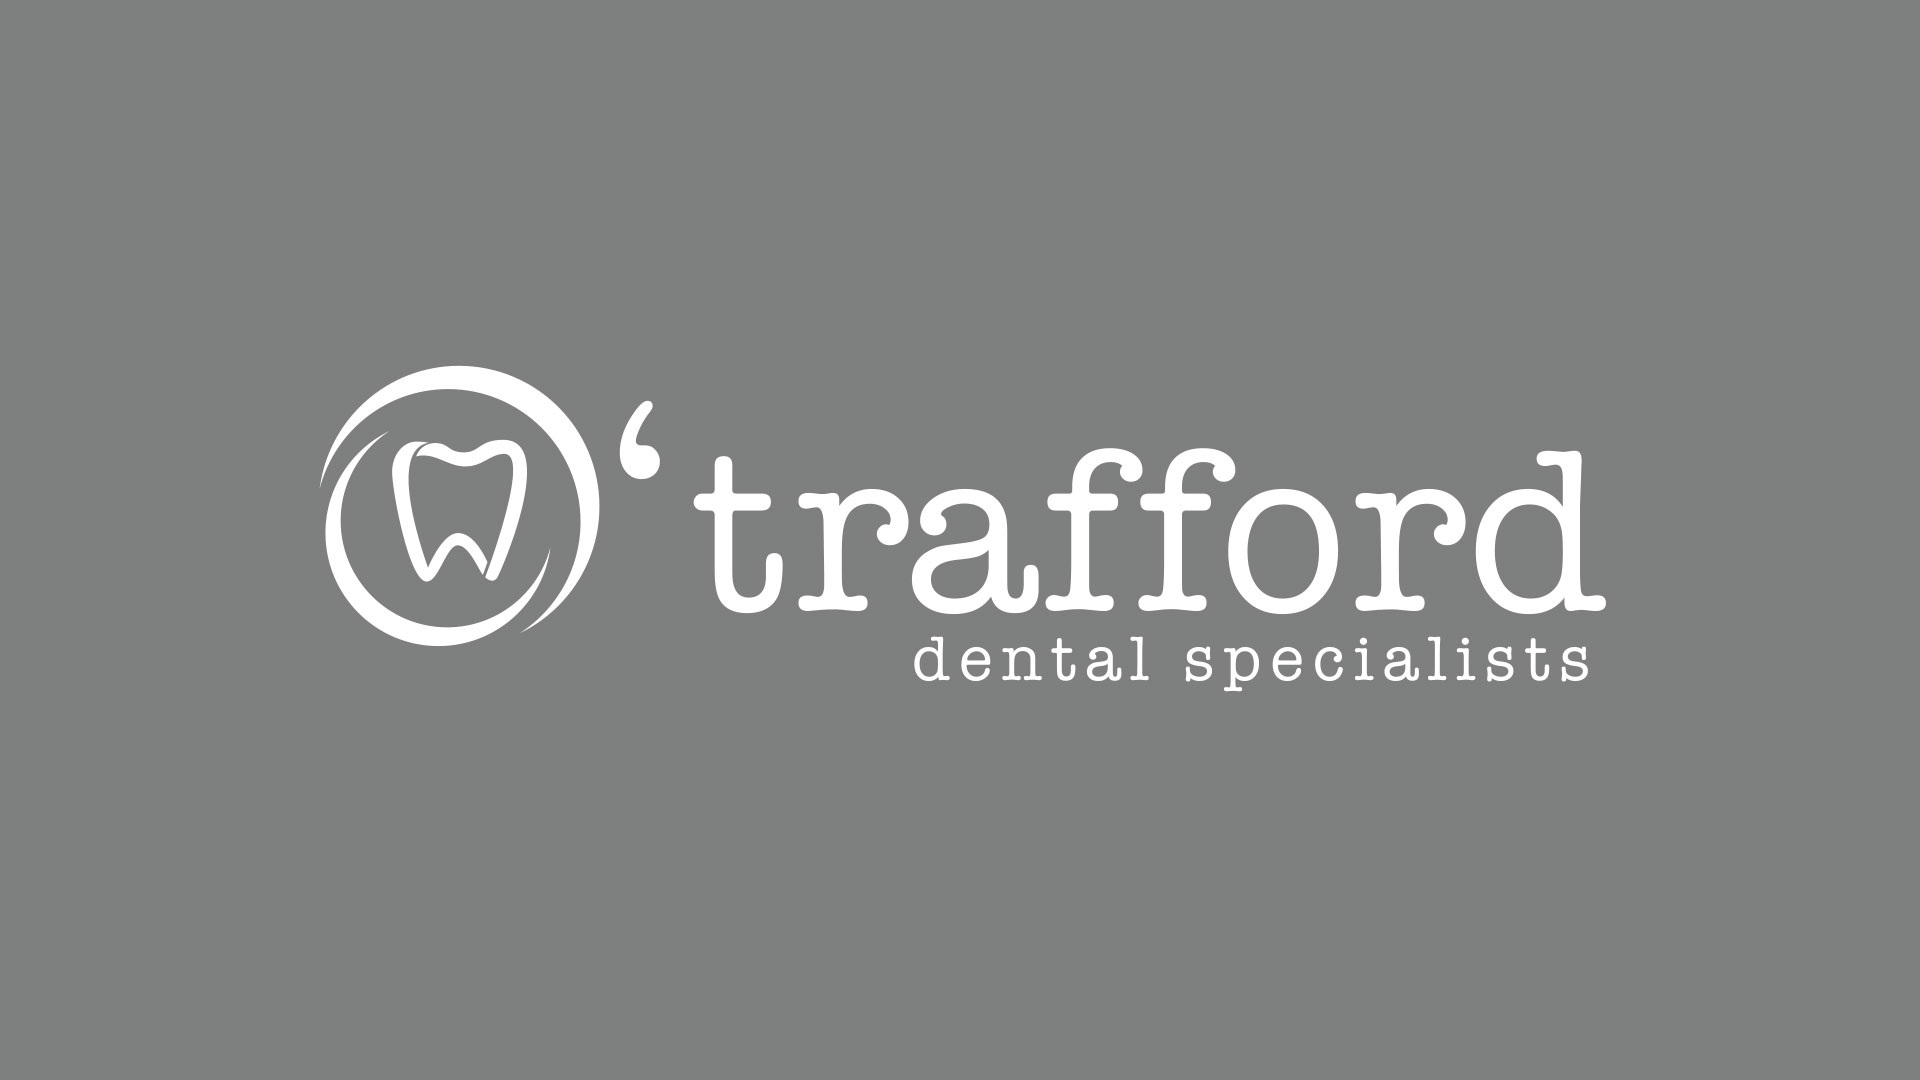 O'Trafford Dental Specialists Γραφίστας Σπύρος Ηλιόπουλος